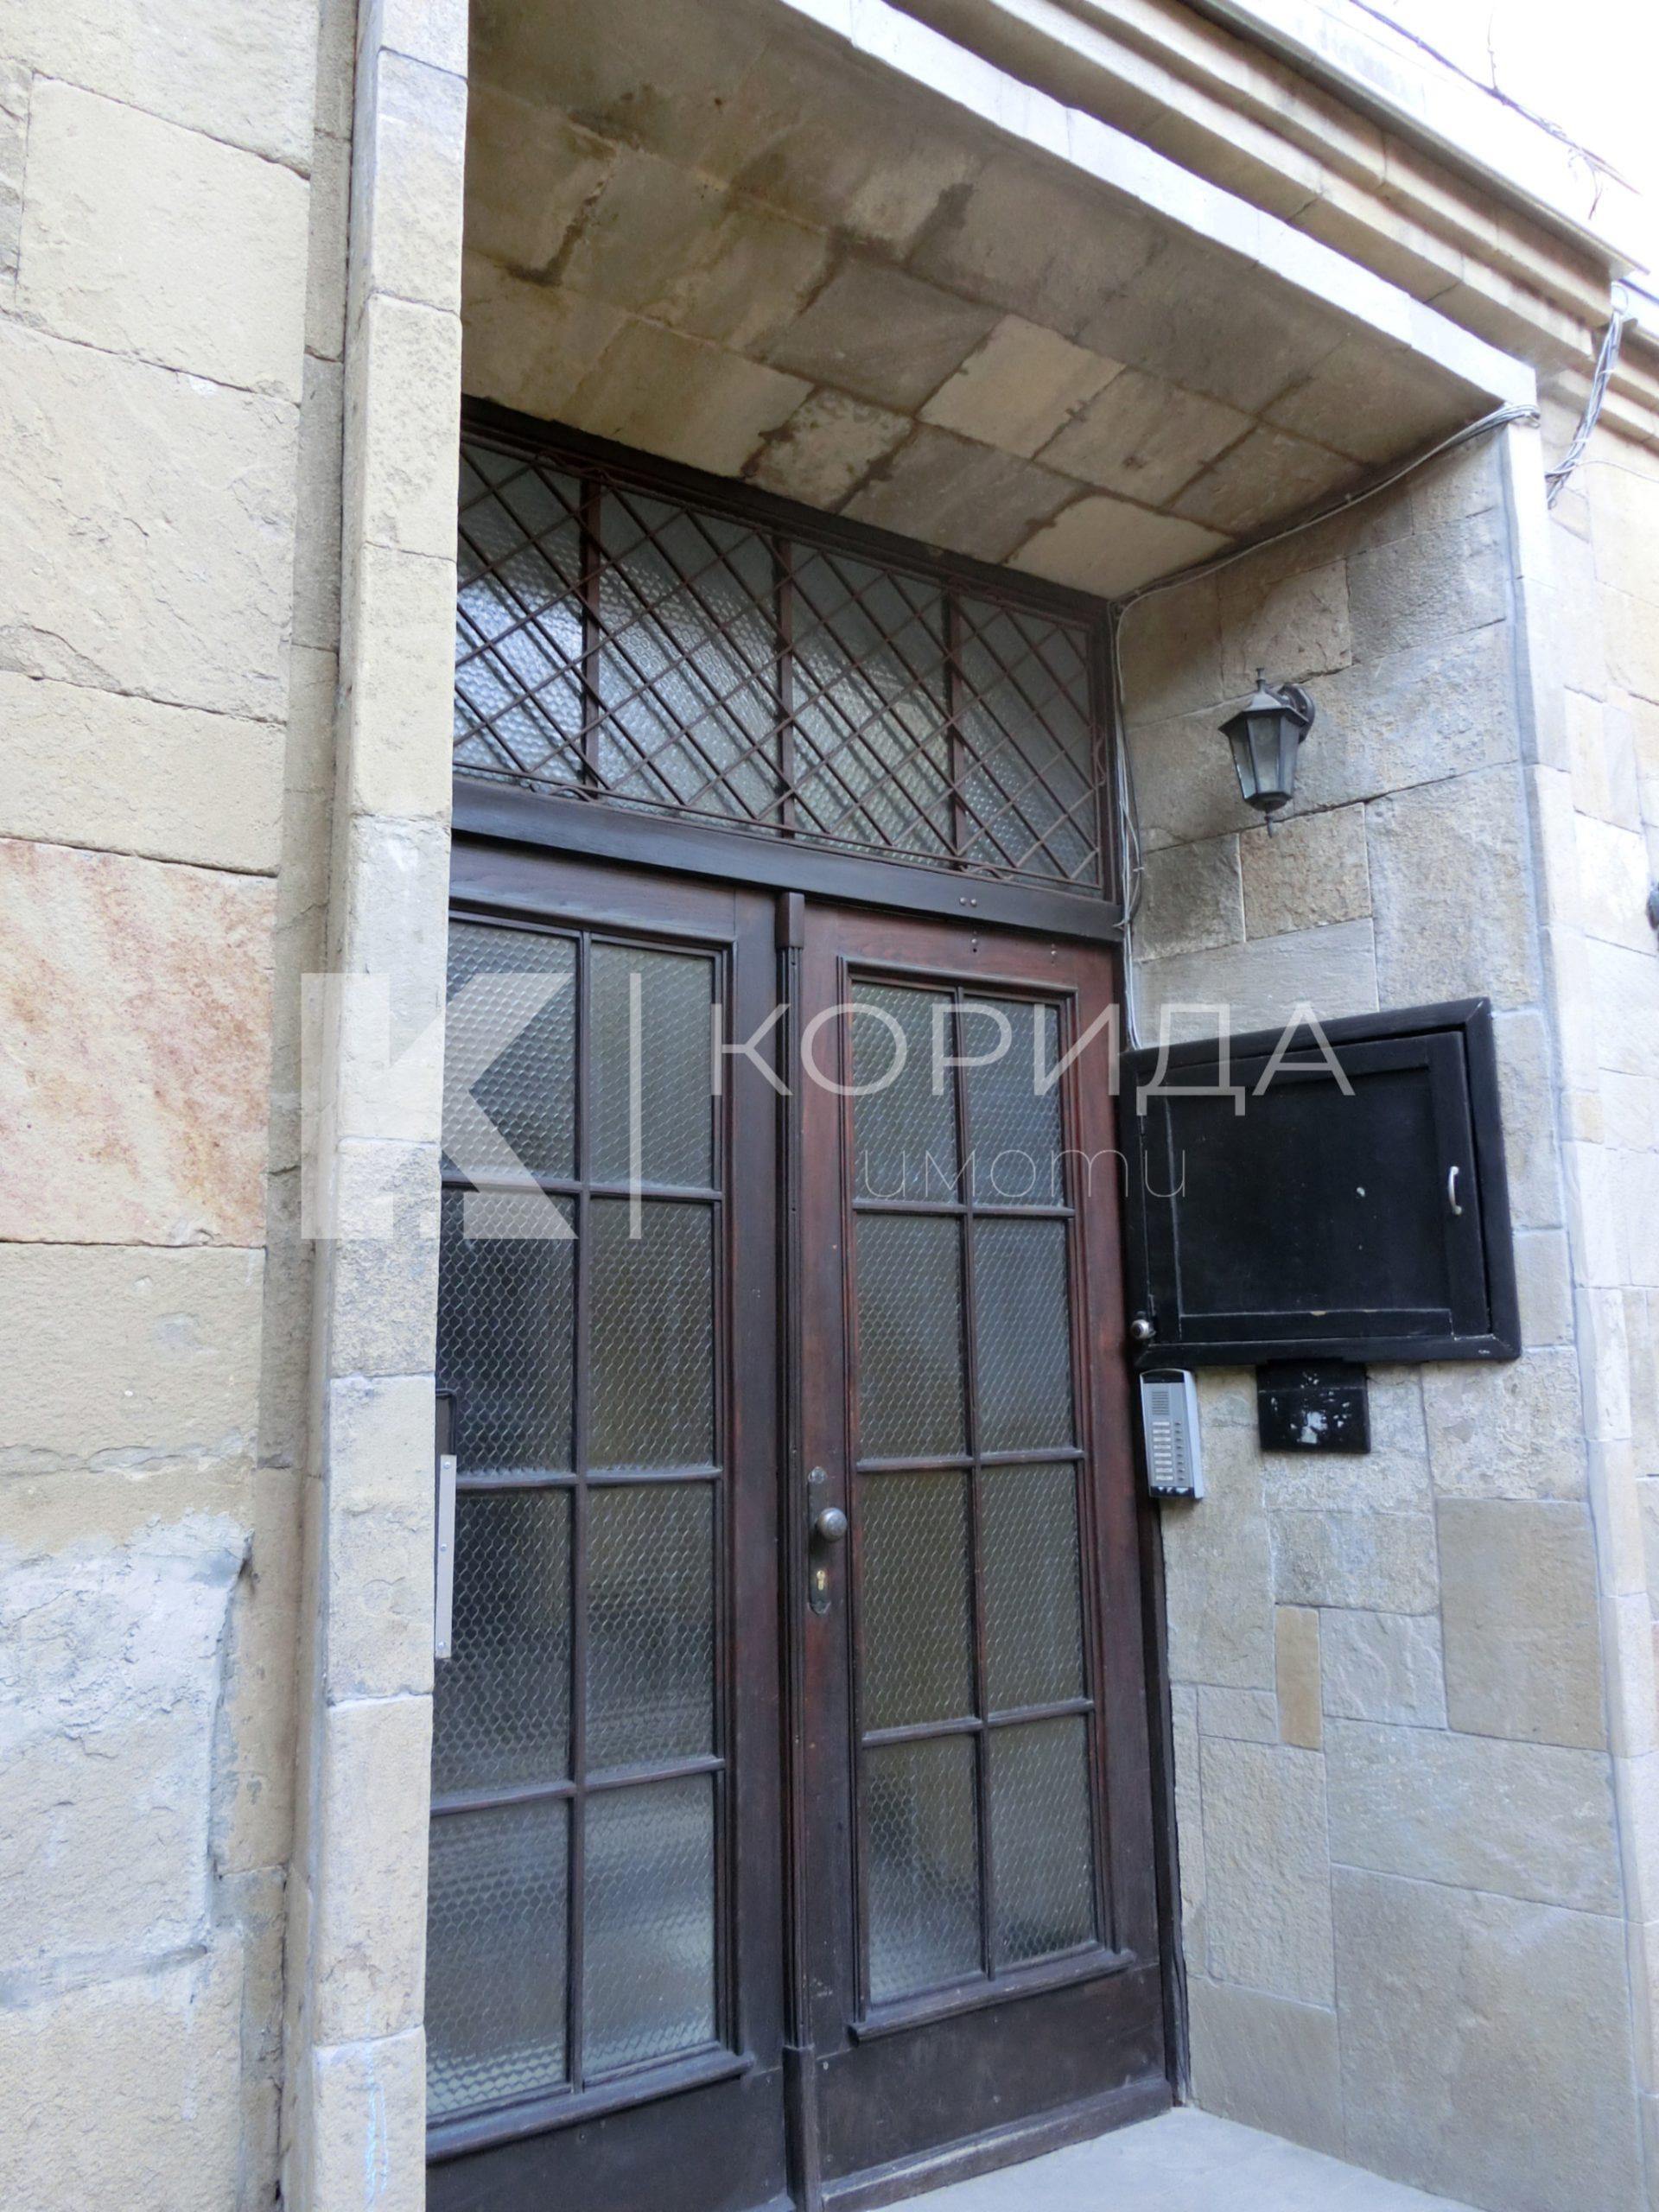 3-стаен апартамент на ул. Цанко Церковски